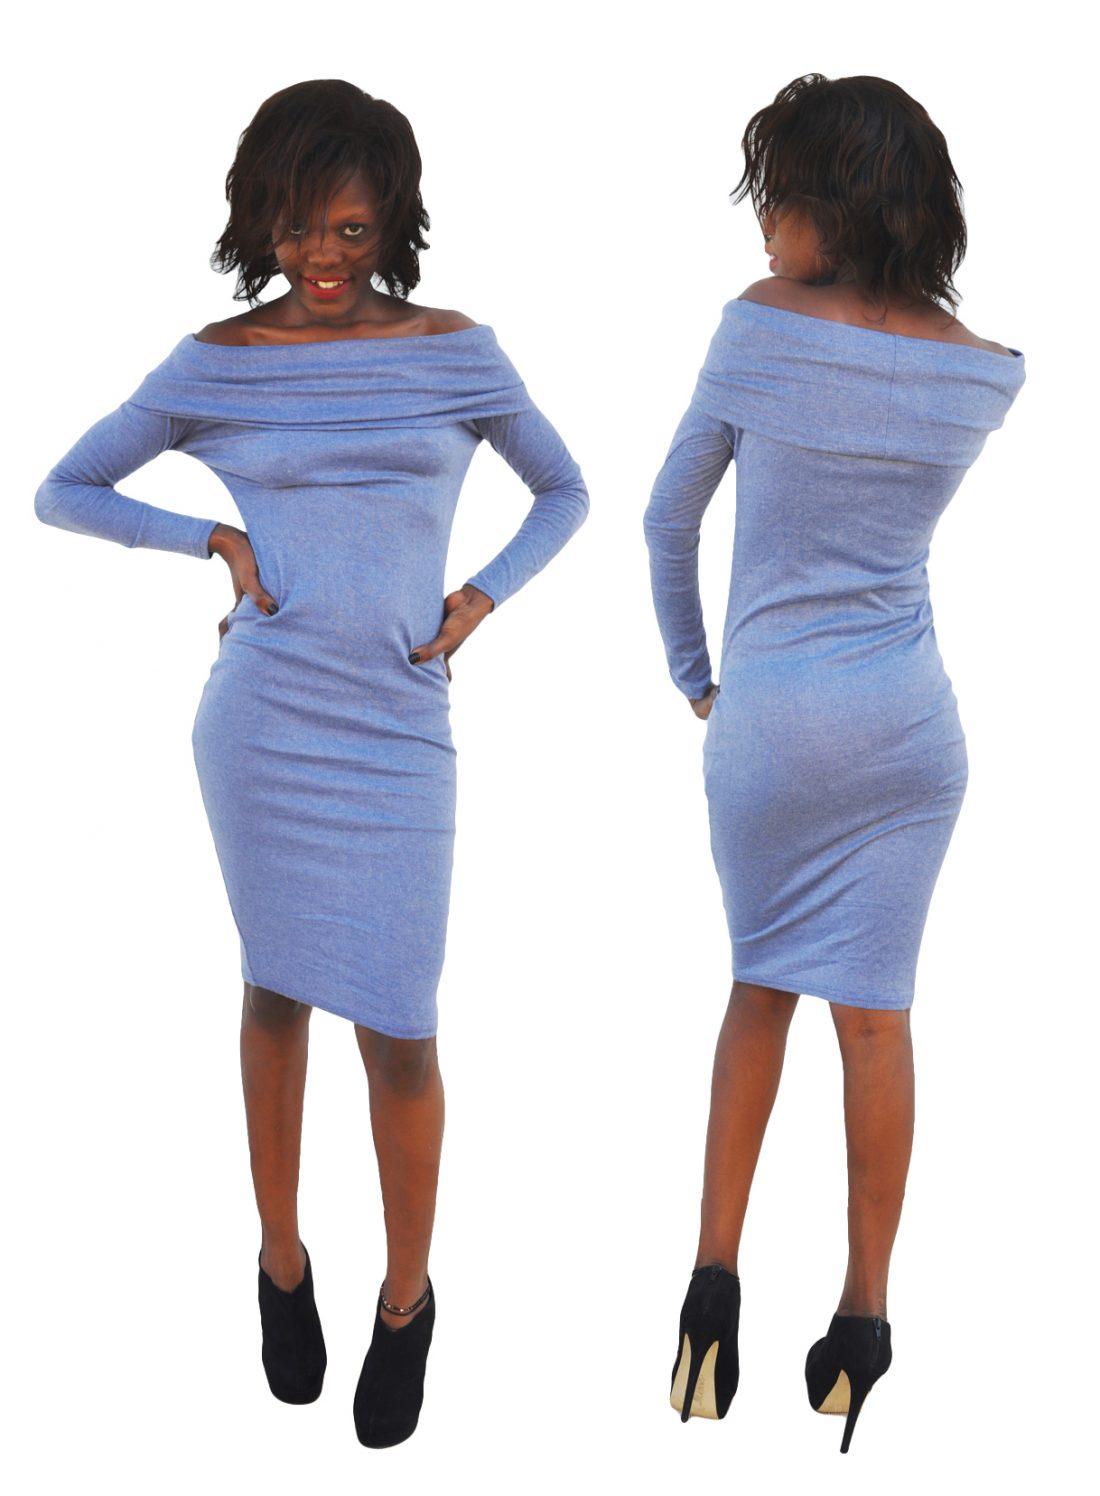 M0268 blue2 Long Sleeve Dresses maureens.com boutique